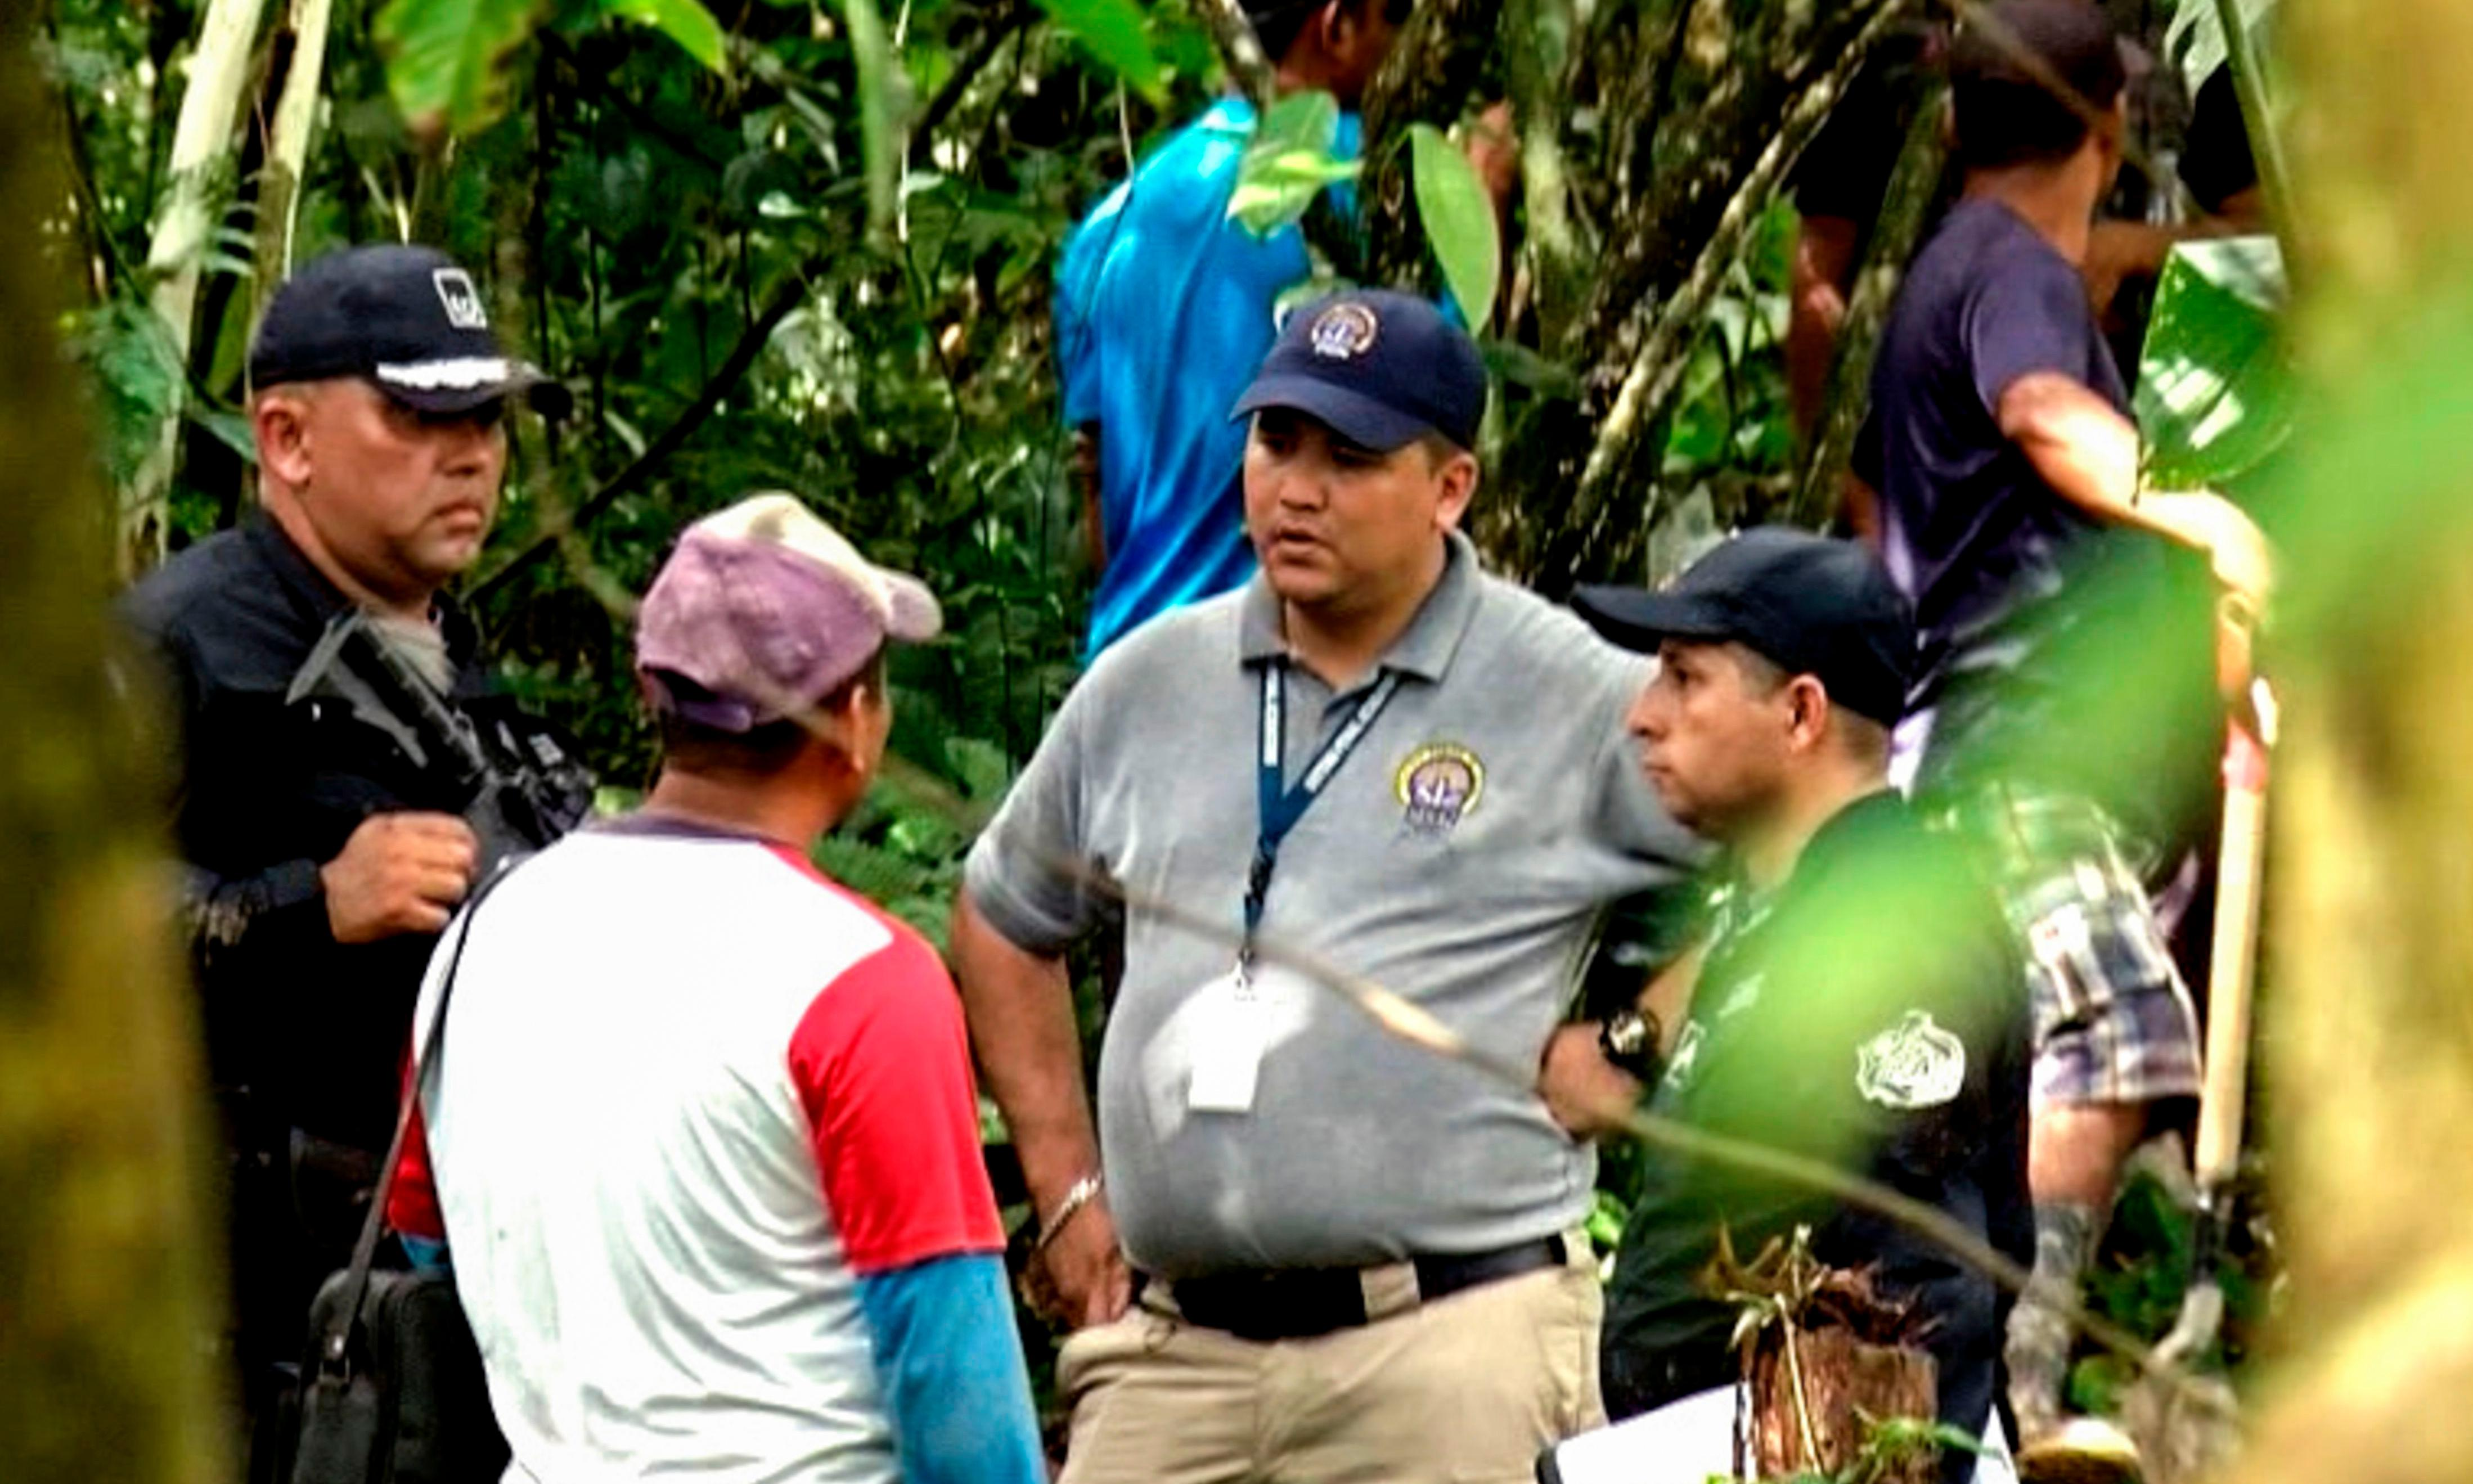 'Repent or die': Panama religious sect kills seven in bizarre ritual